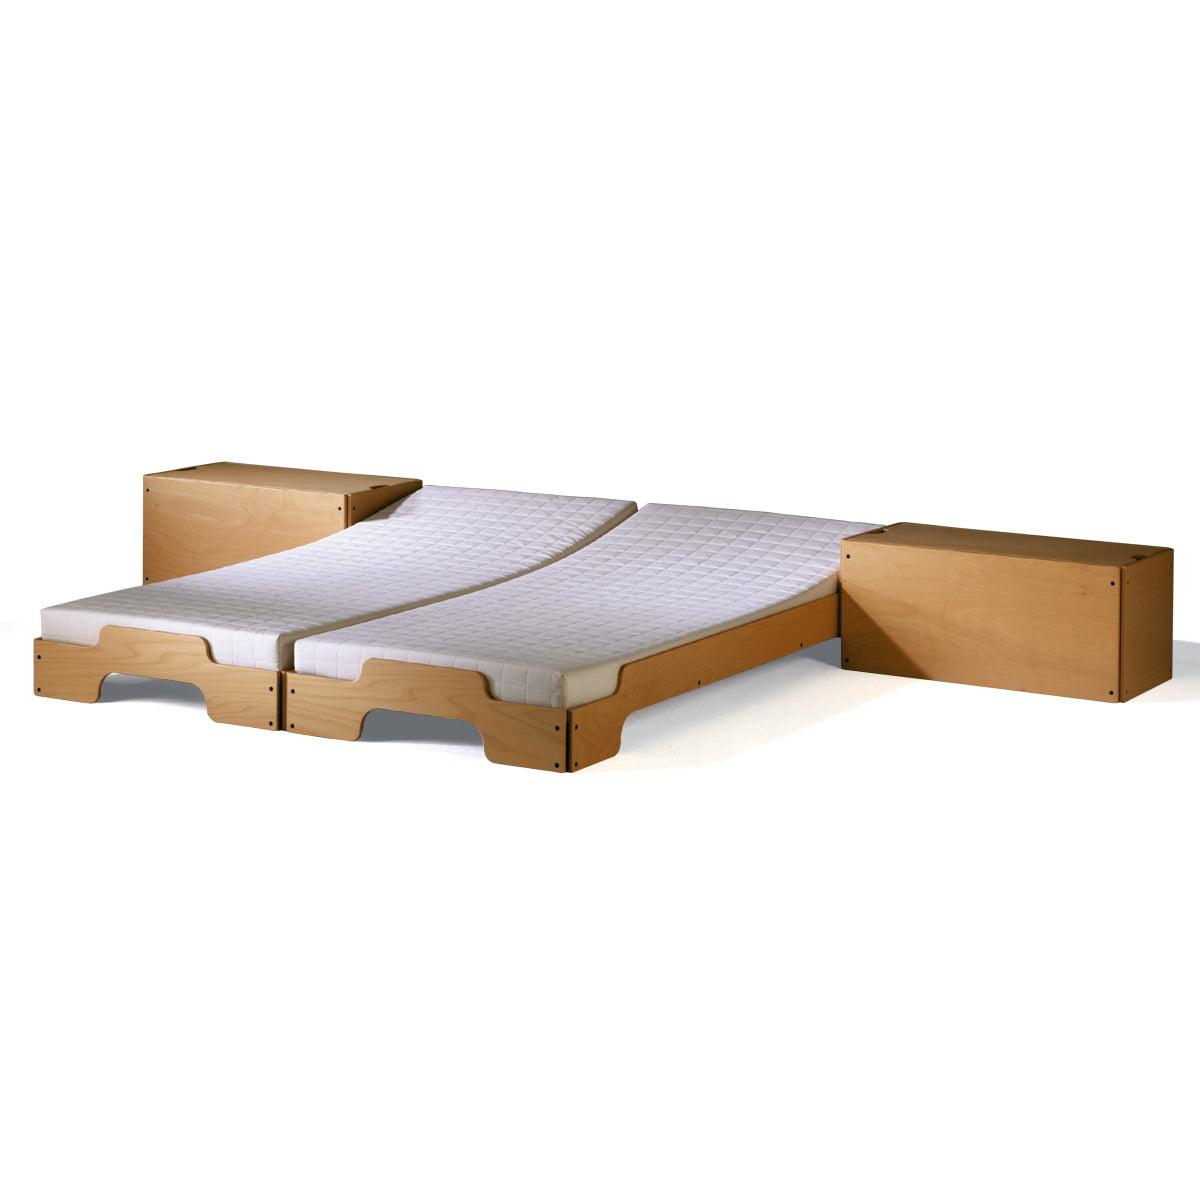 stapelliege buche rolf heide shop. Black Bedroom Furniture Sets. Home Design Ideas